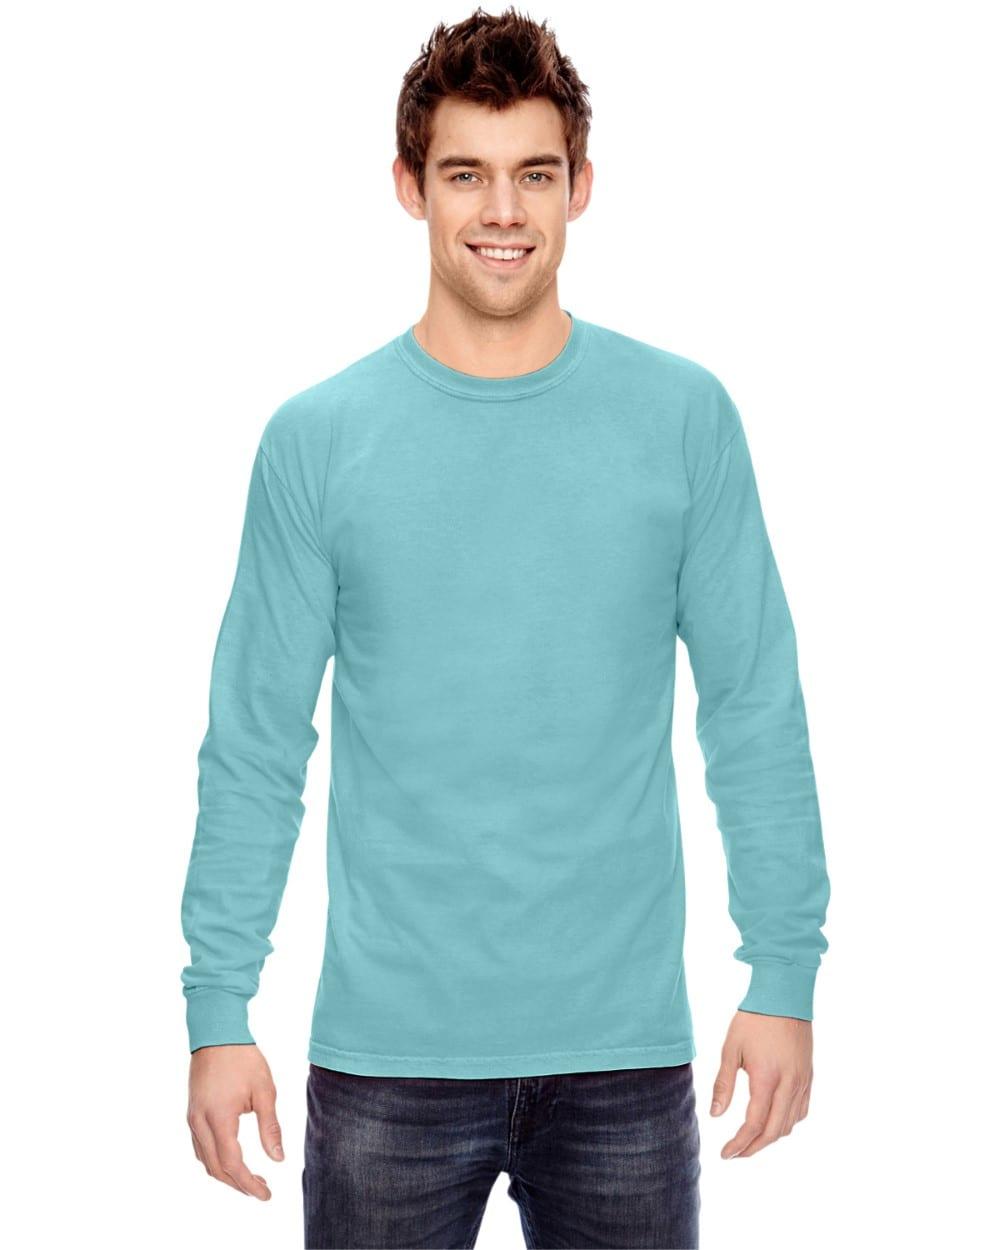 3f34c6fd Comfort Colors C6014 heavyweight custom long sleeve shirt bulk custom  shirts chalky mint